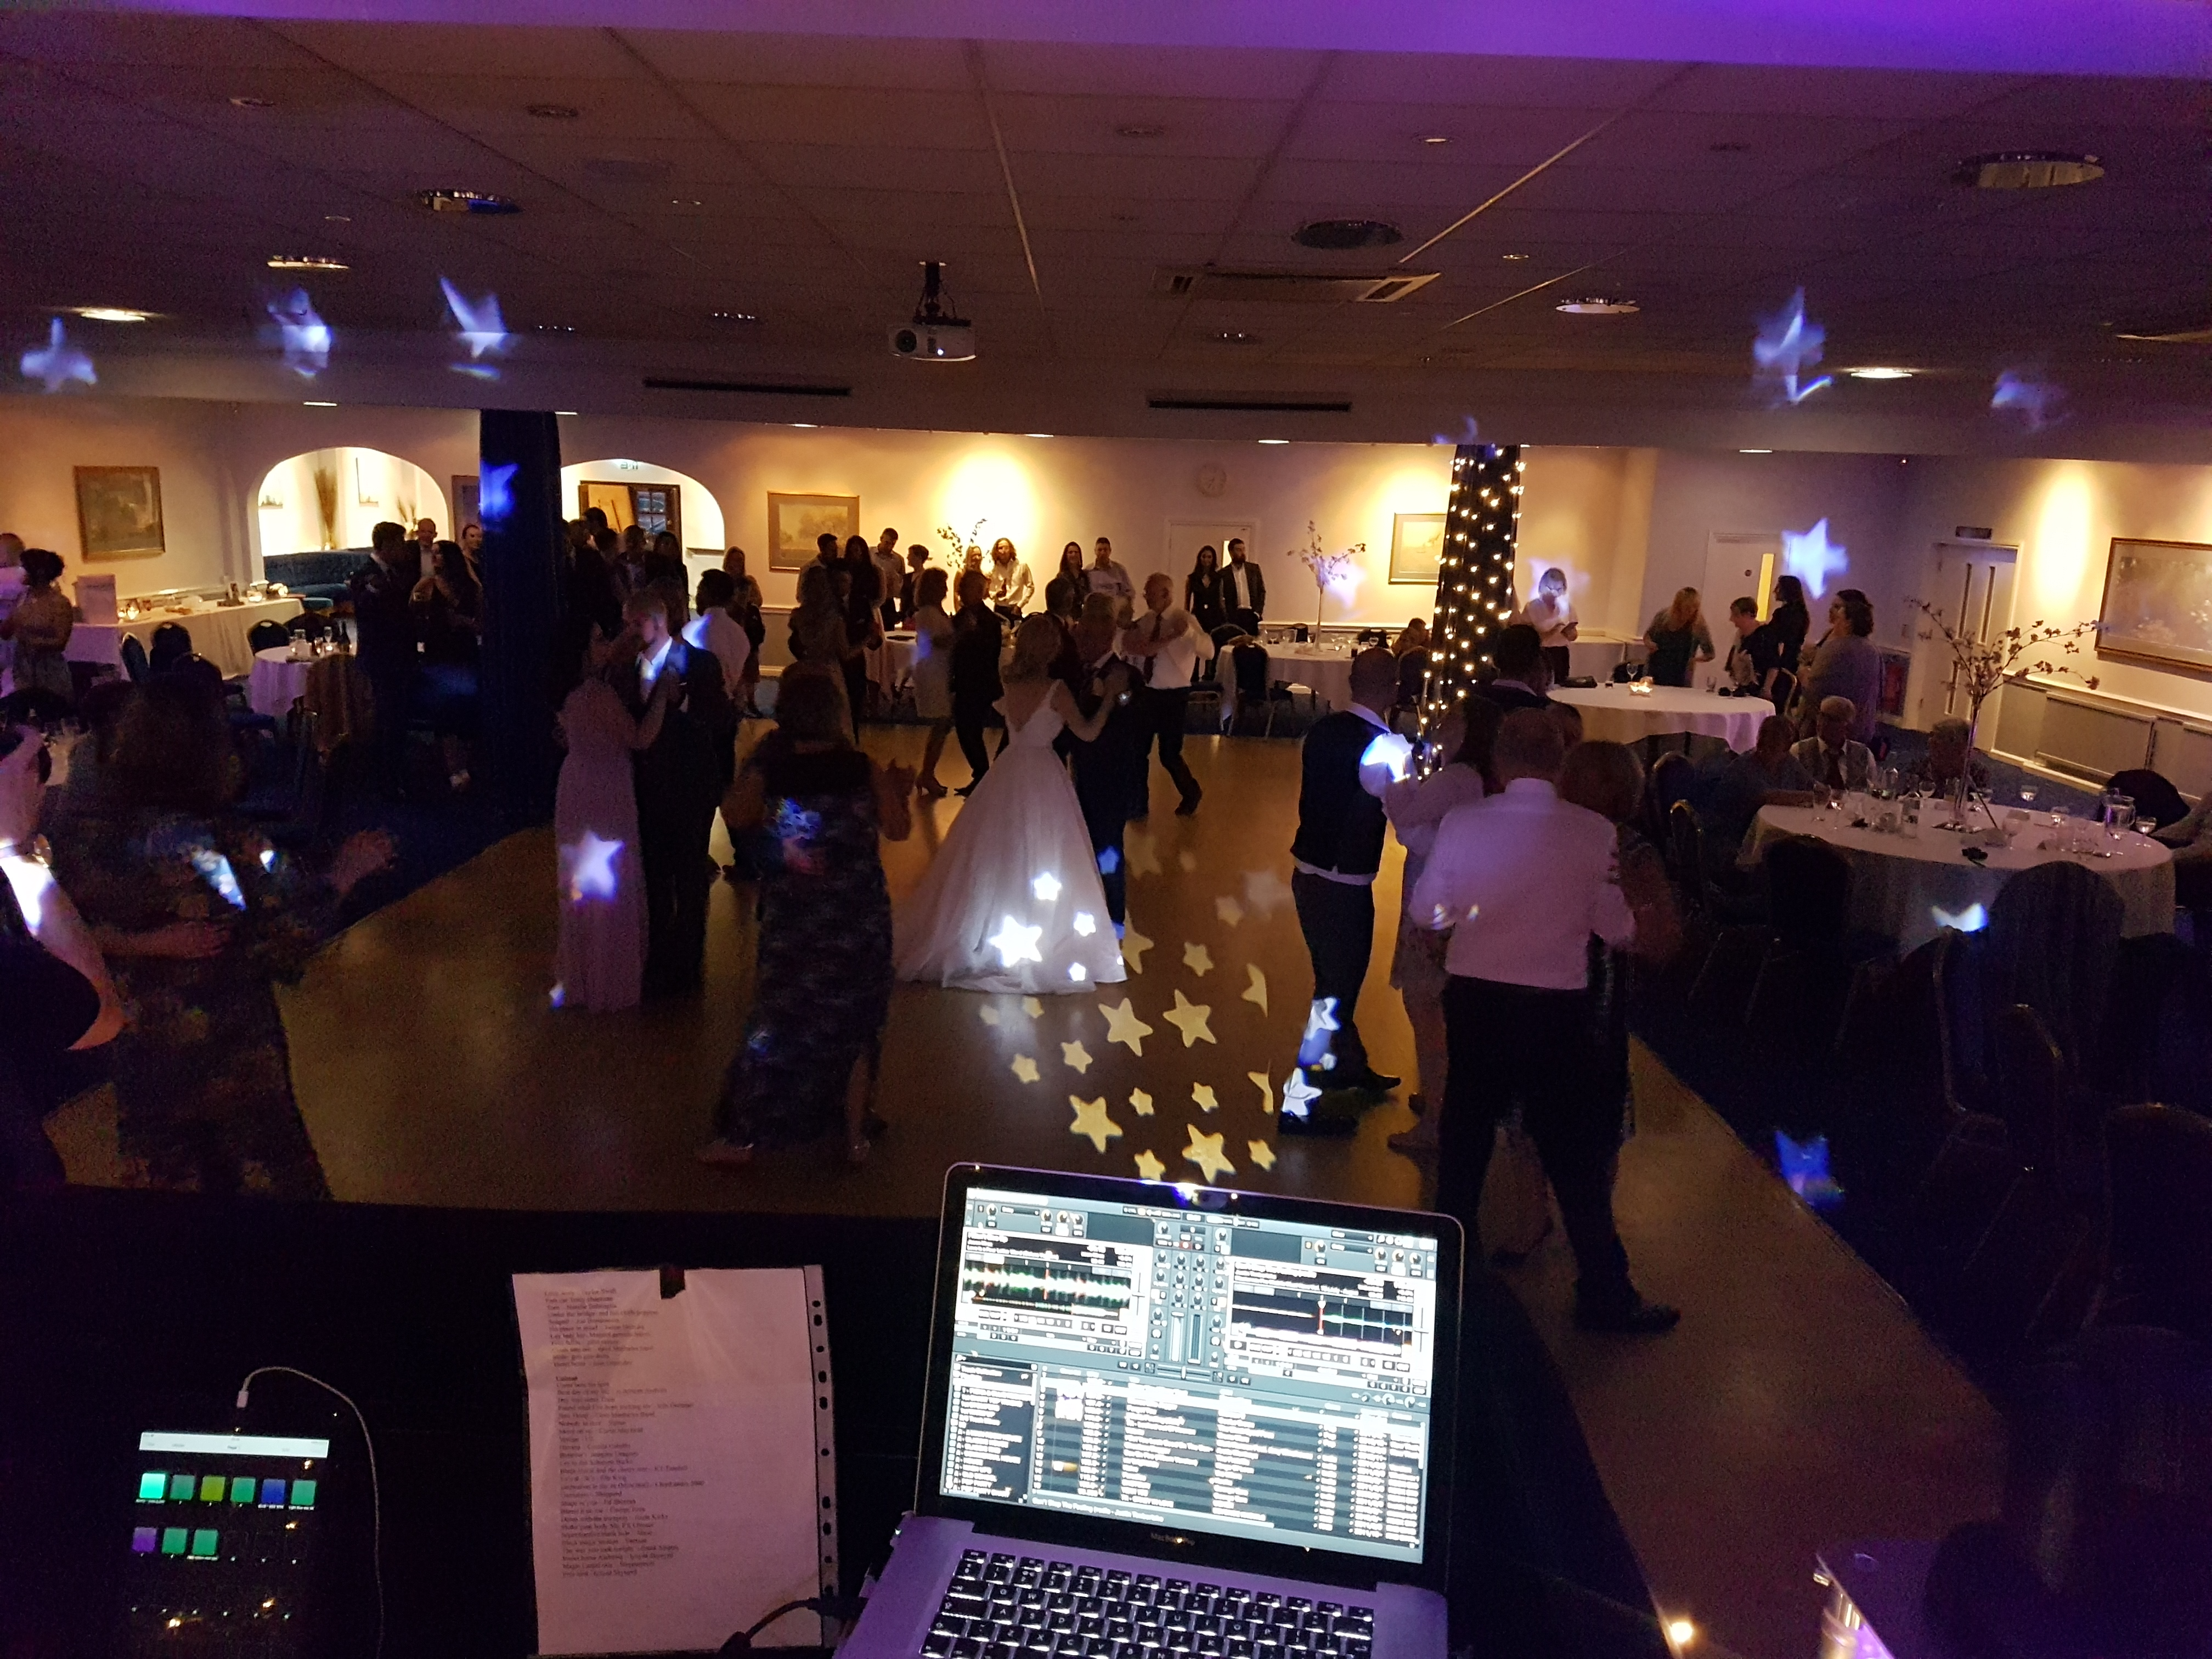 WOKINGHAM WEDDING DJ